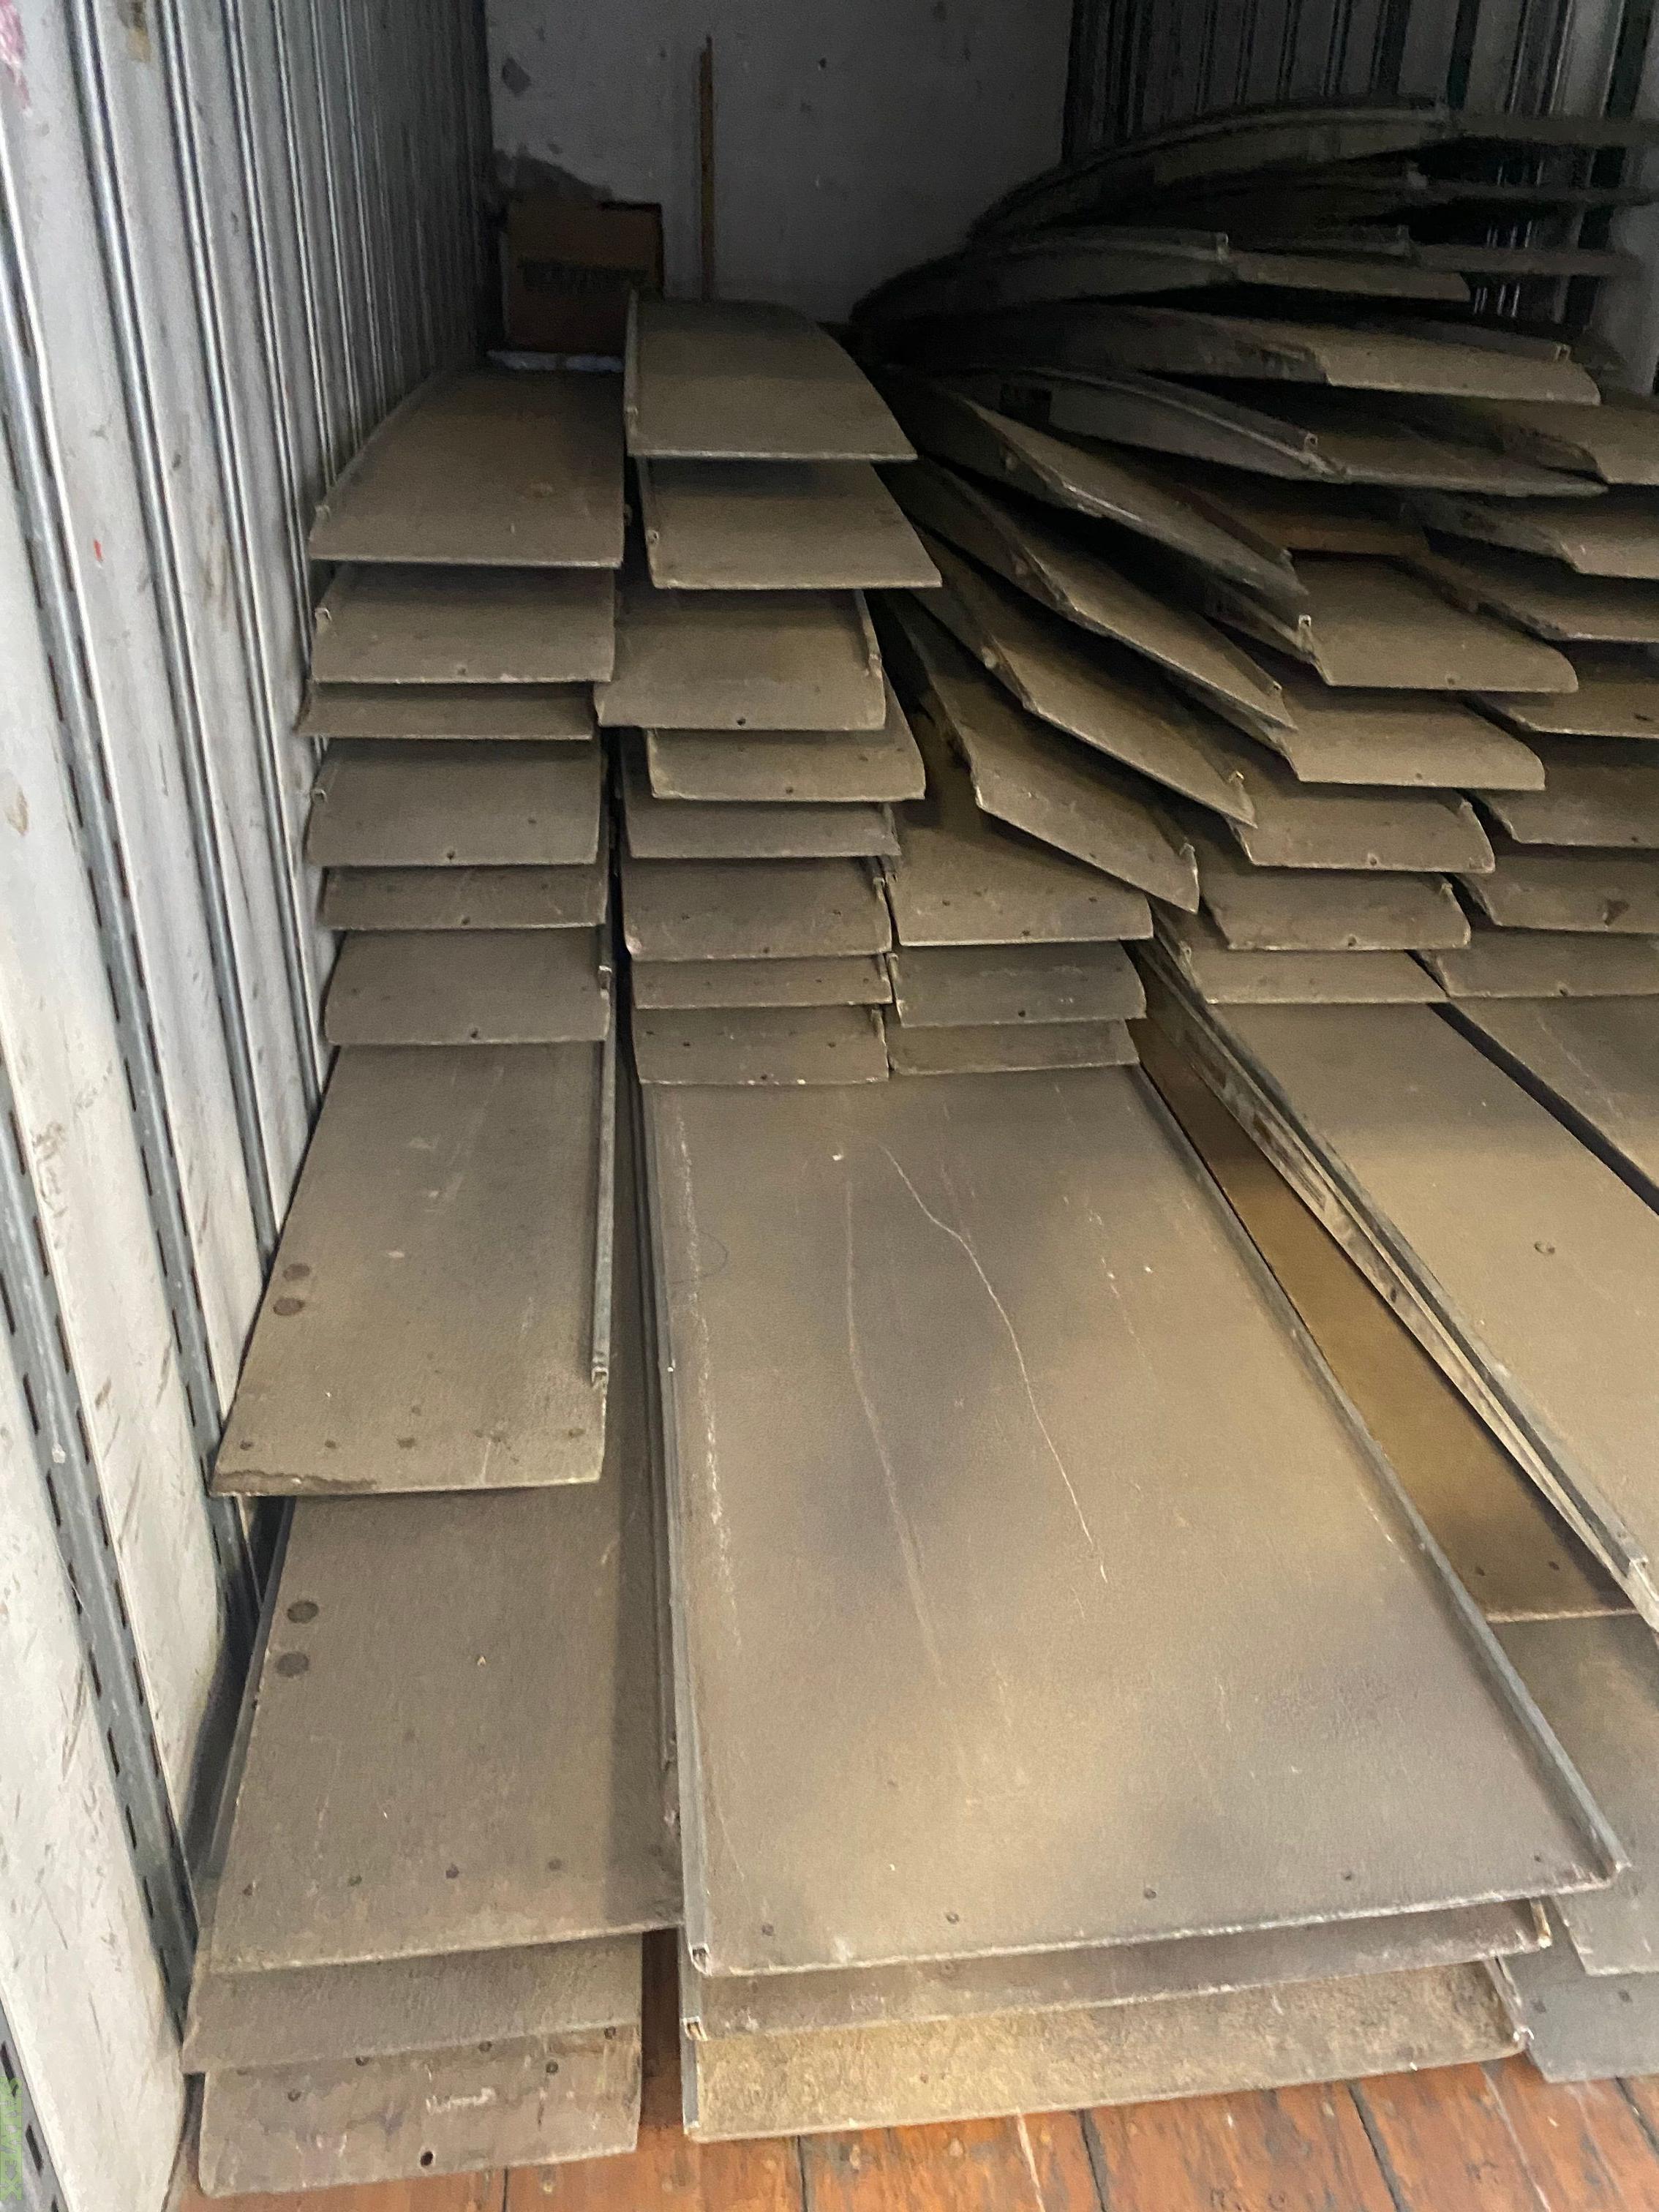 Fiberglass and Aluminum Trailer Ramps (20 Units)